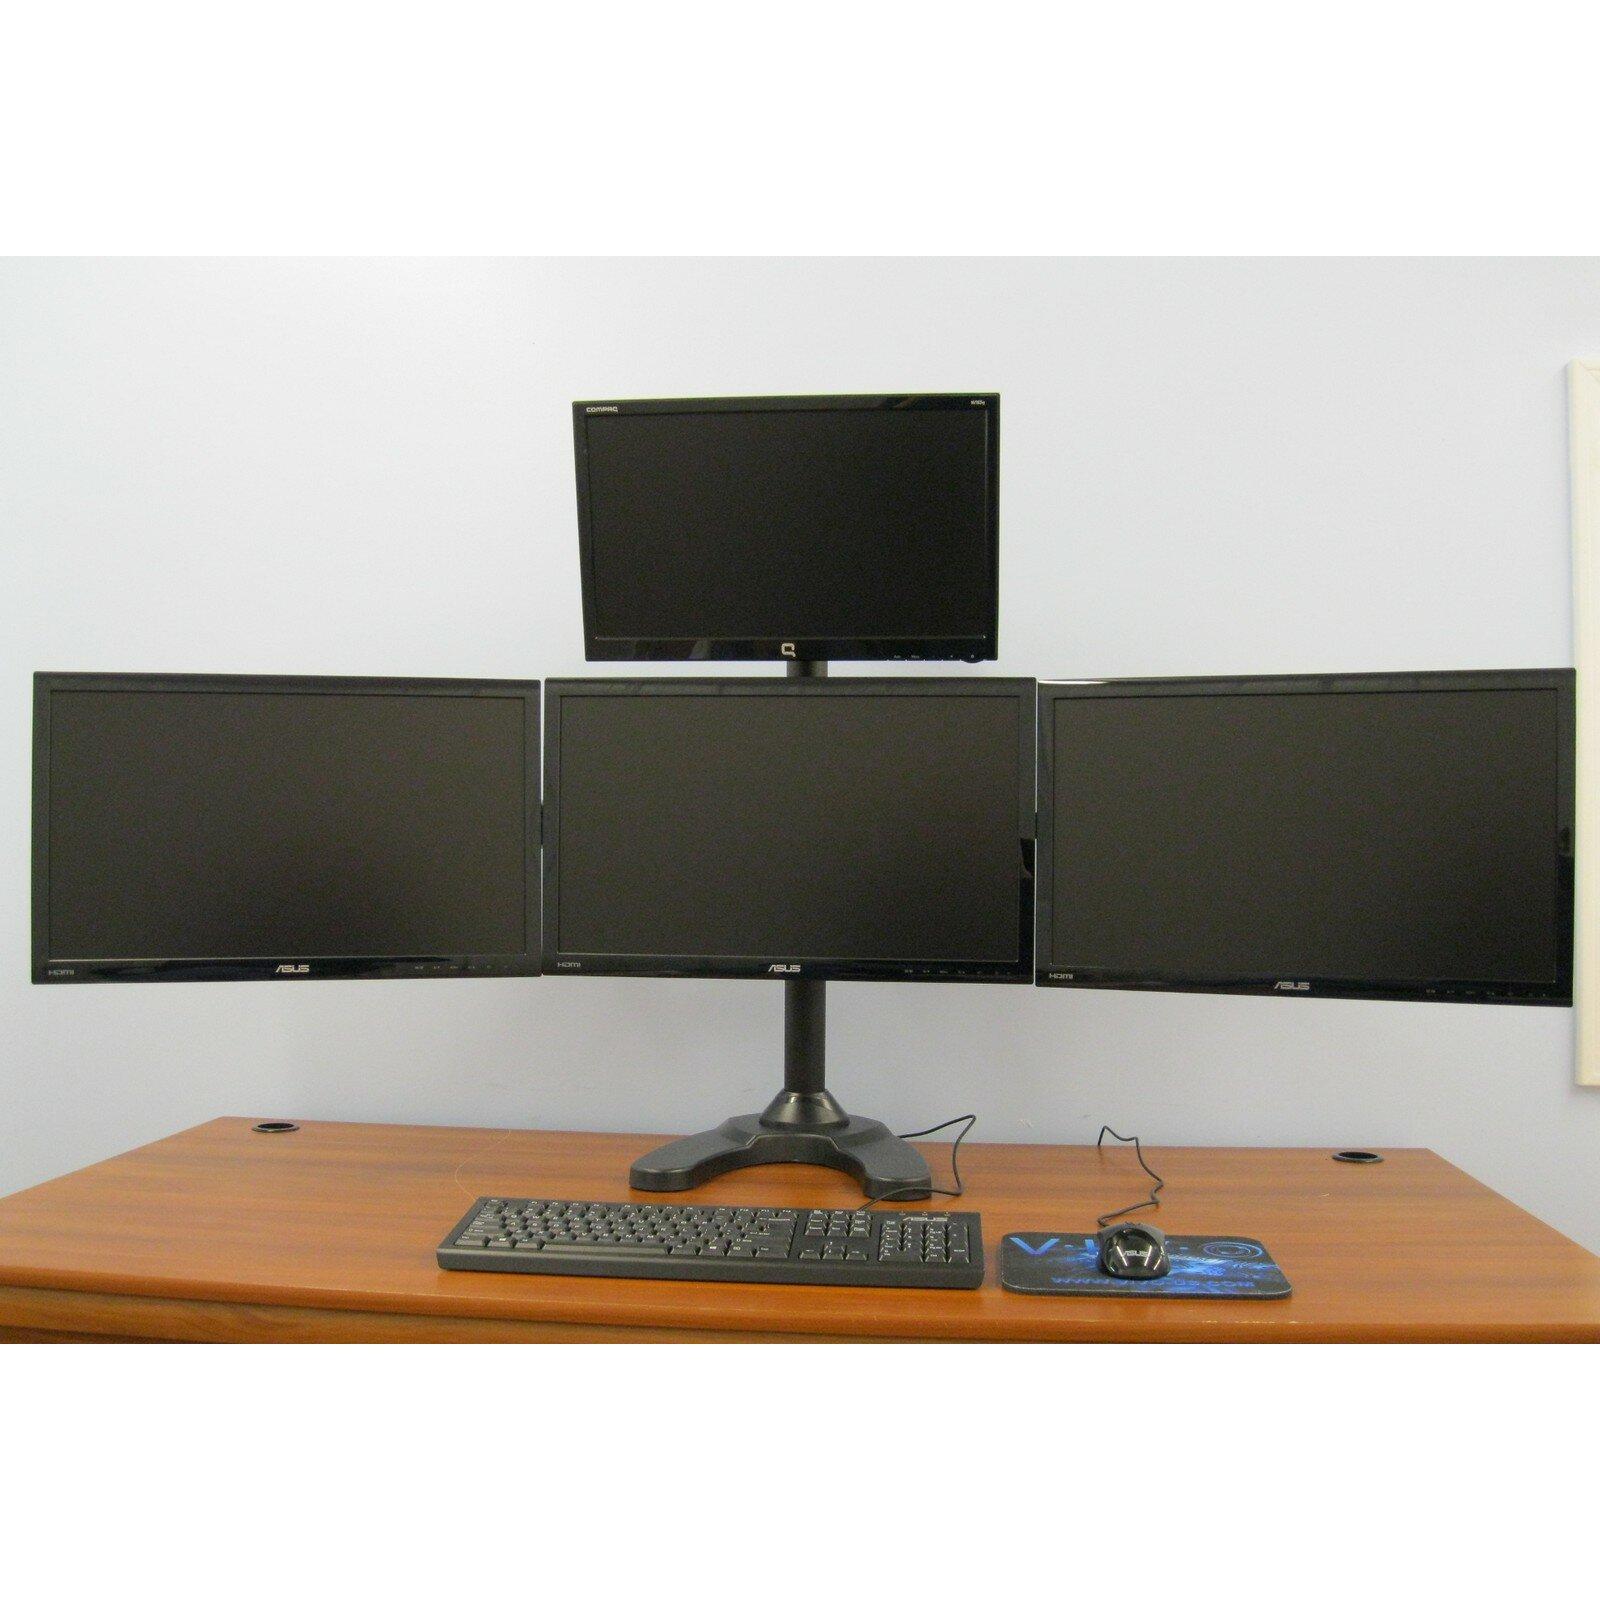 Vivo Quad Lcd Monitor Free Standing Height Adjustable 4